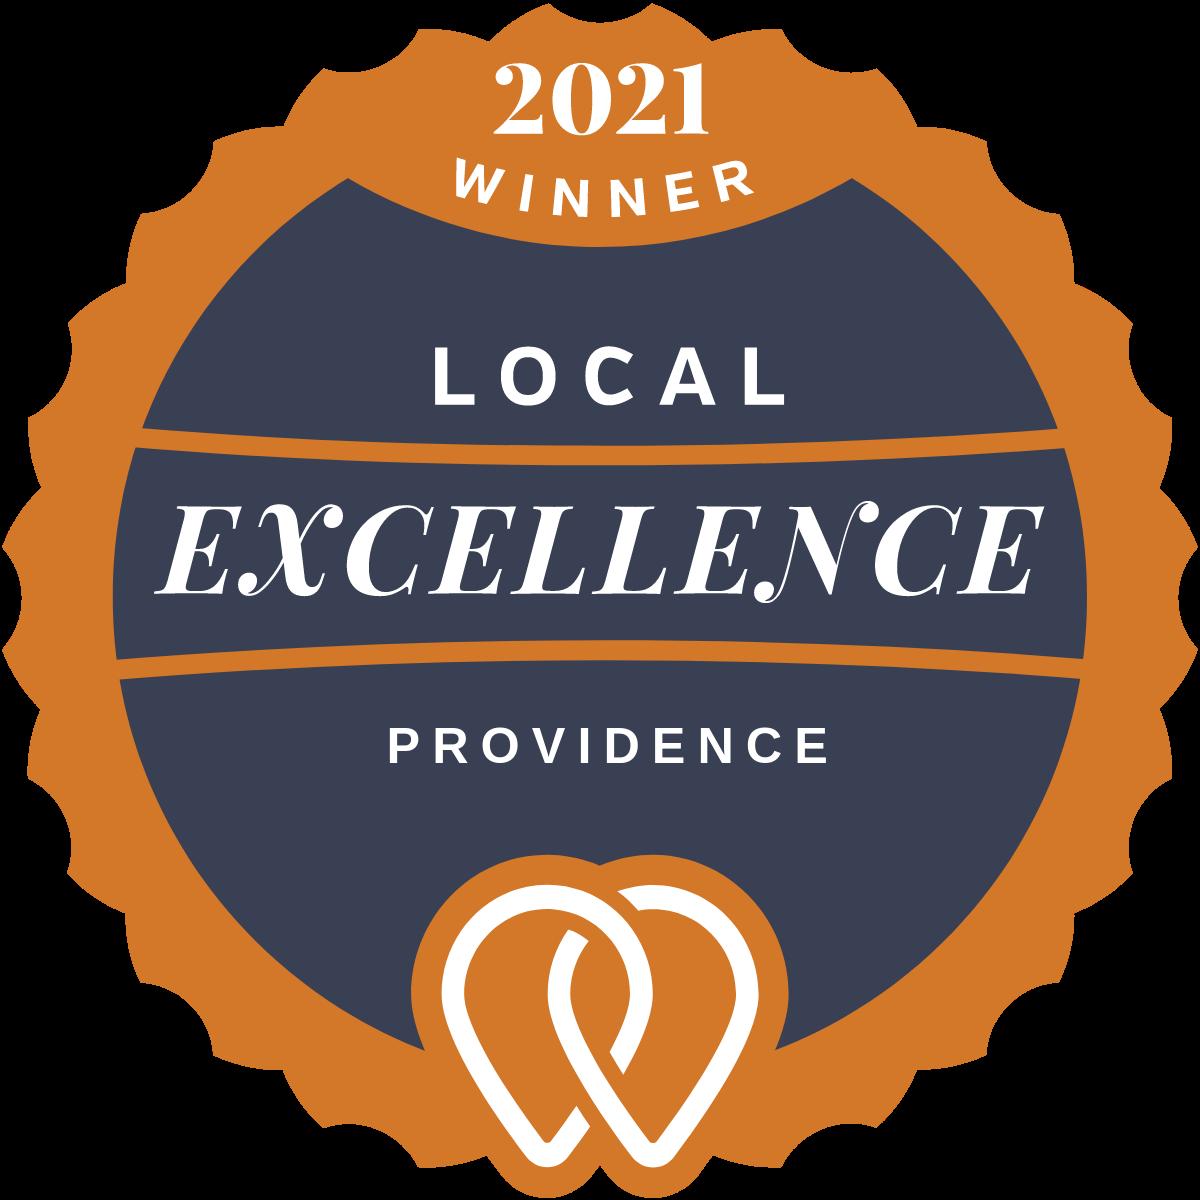 2021 Best Web Design Company in Providence, RI